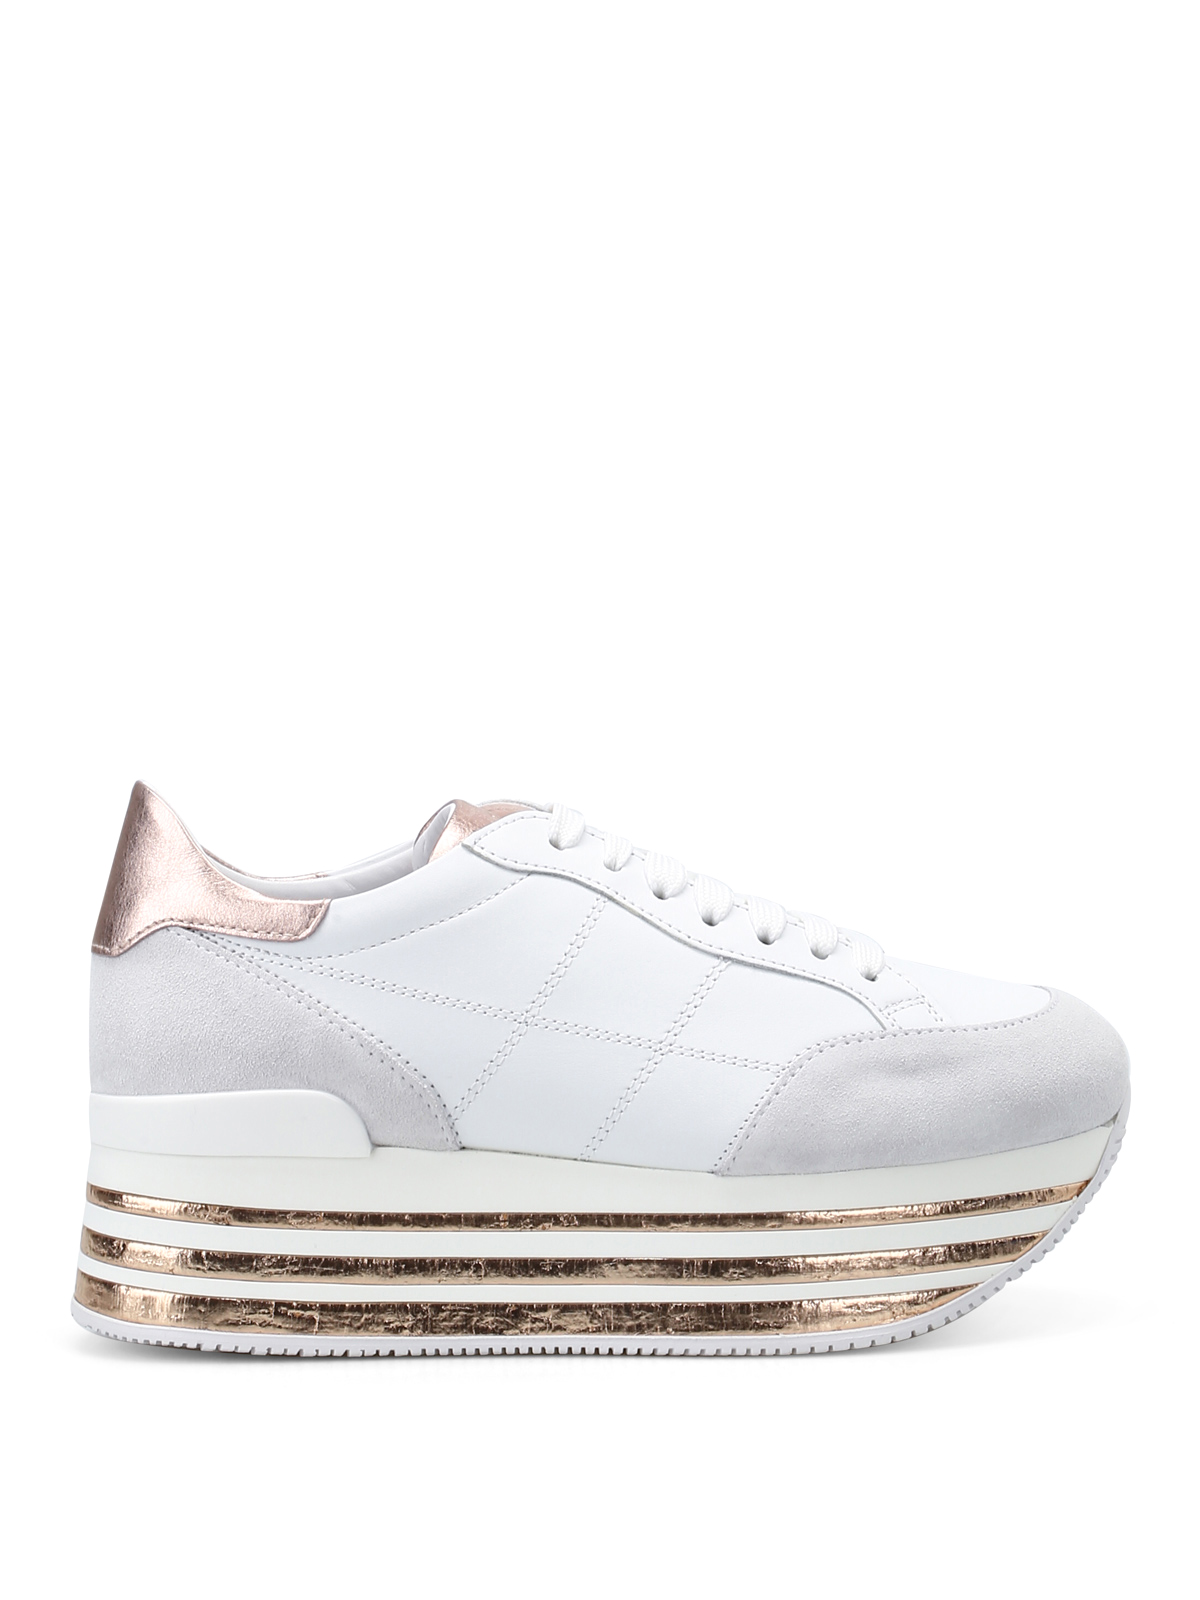 Trainers Hogan - Maxi platform two-tone sneakers - HXW3490J061I7X0989